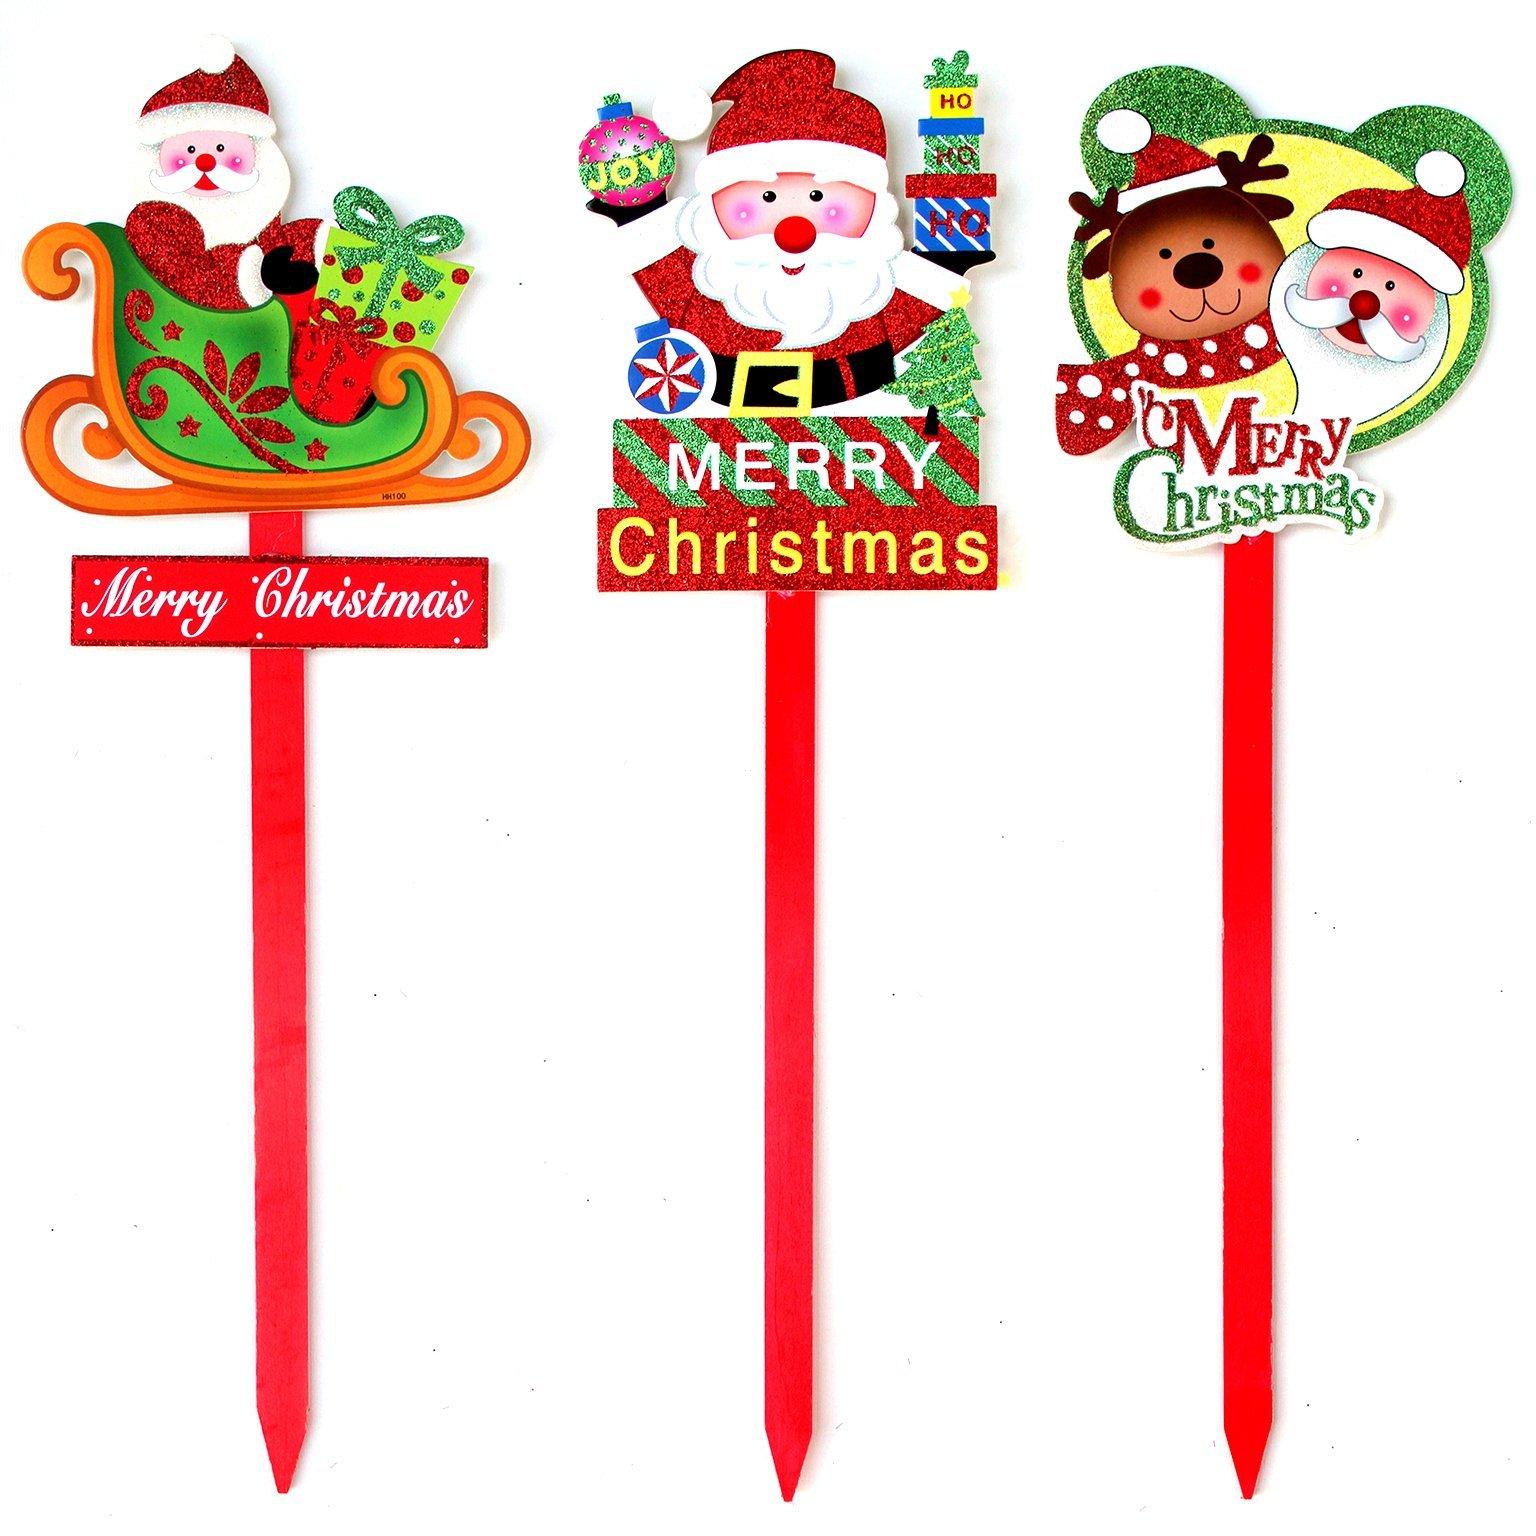 Merry Christmas Glitter Santa Signs Spikes Plaque Xmas Tree ...